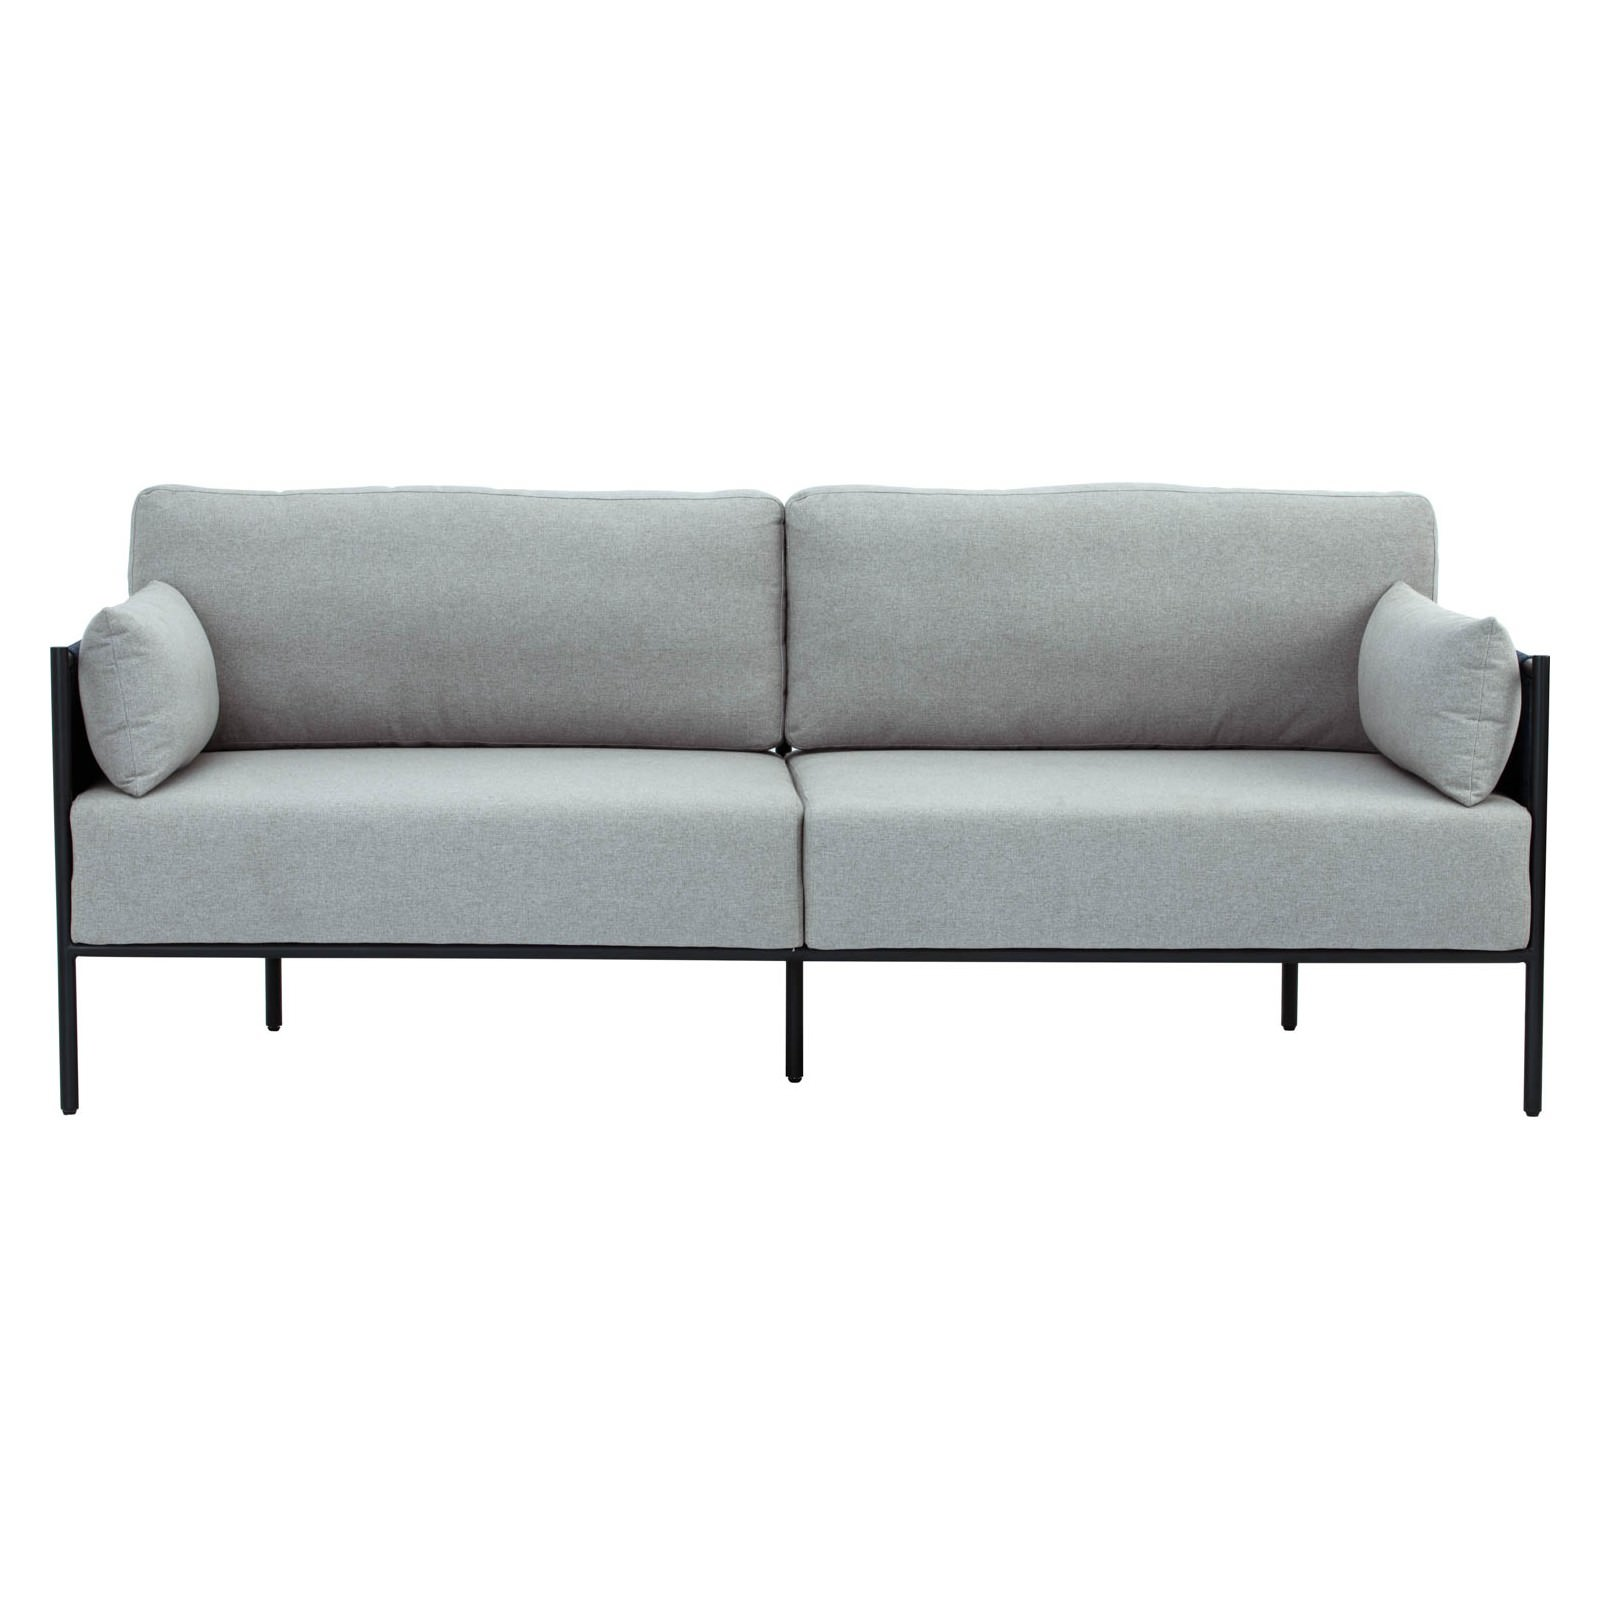 Tredia Commercial Grade Fabric & Metal Sofa, 3 Seater, Grey / Dark Blue